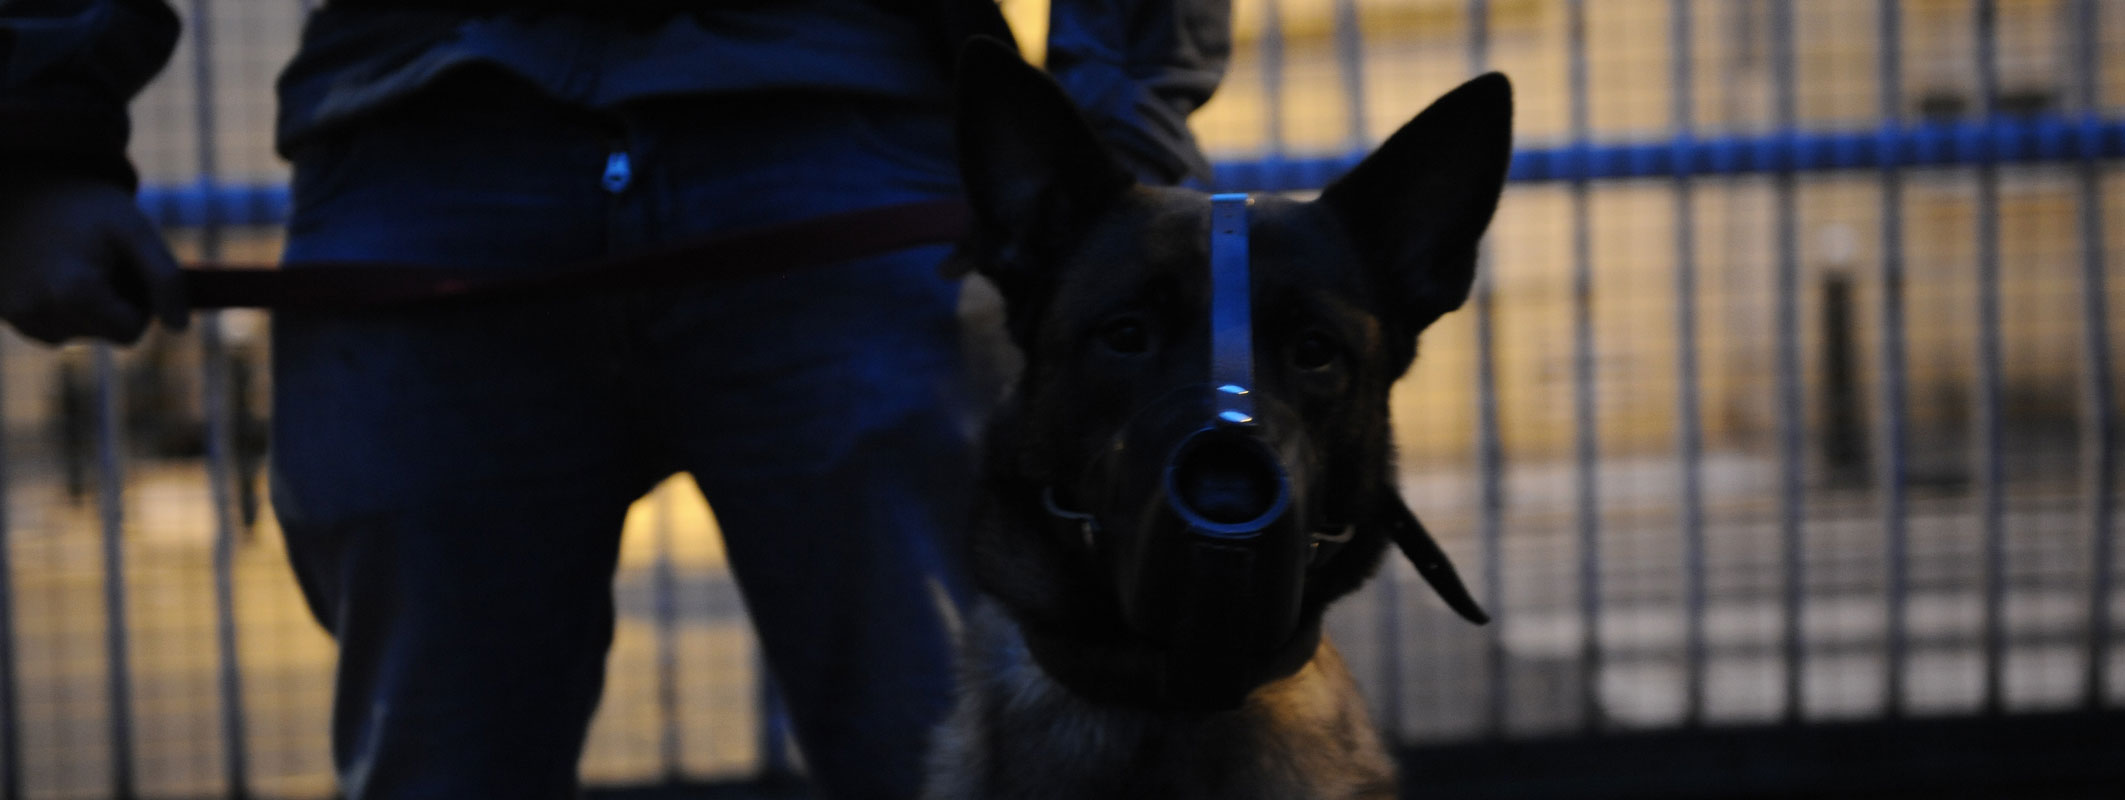 plan du site brigade canine